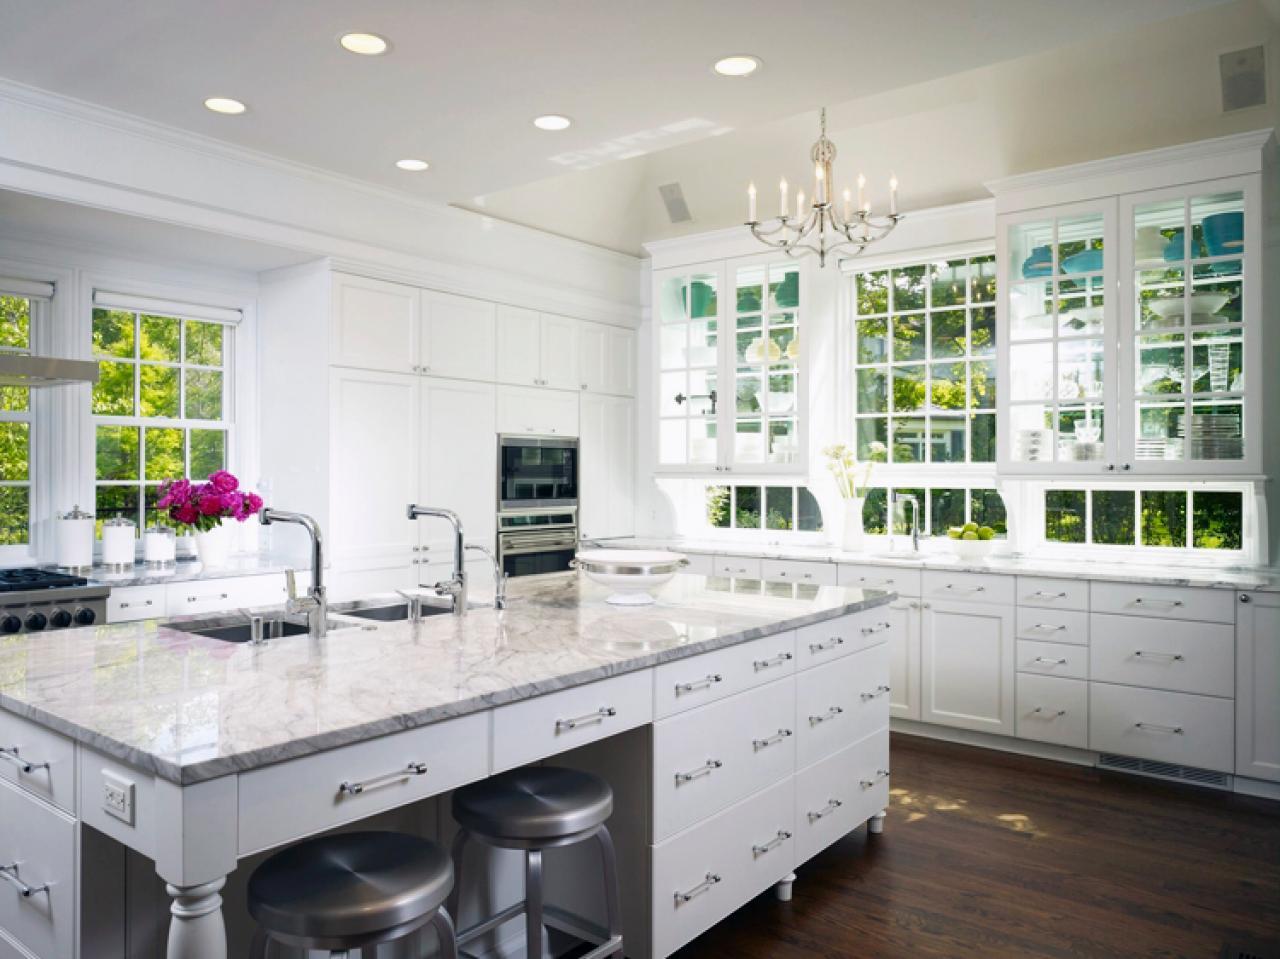 Kitchen Window Treatments Ideas Hgtv Pictures Amp Tips Hgtv